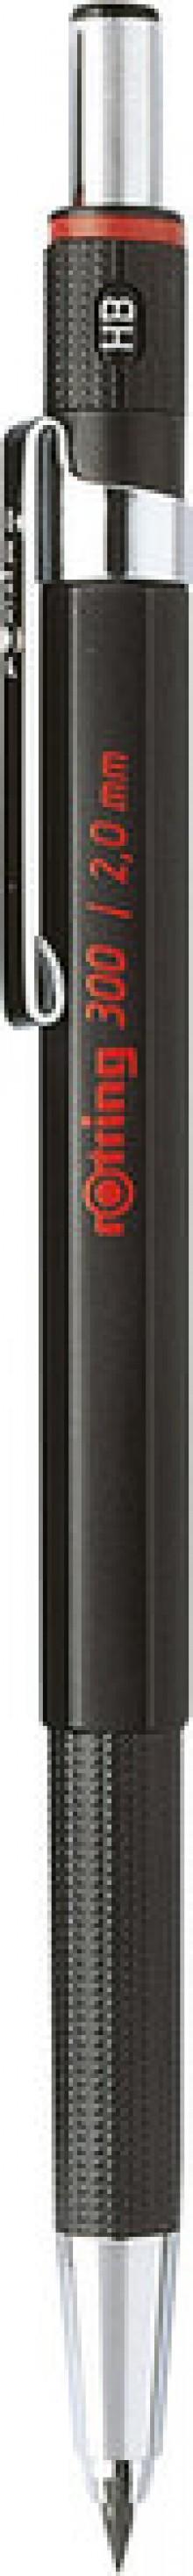 NWL Rotring 300 Fallminenstift 2.0mm Oberfläche schwarz